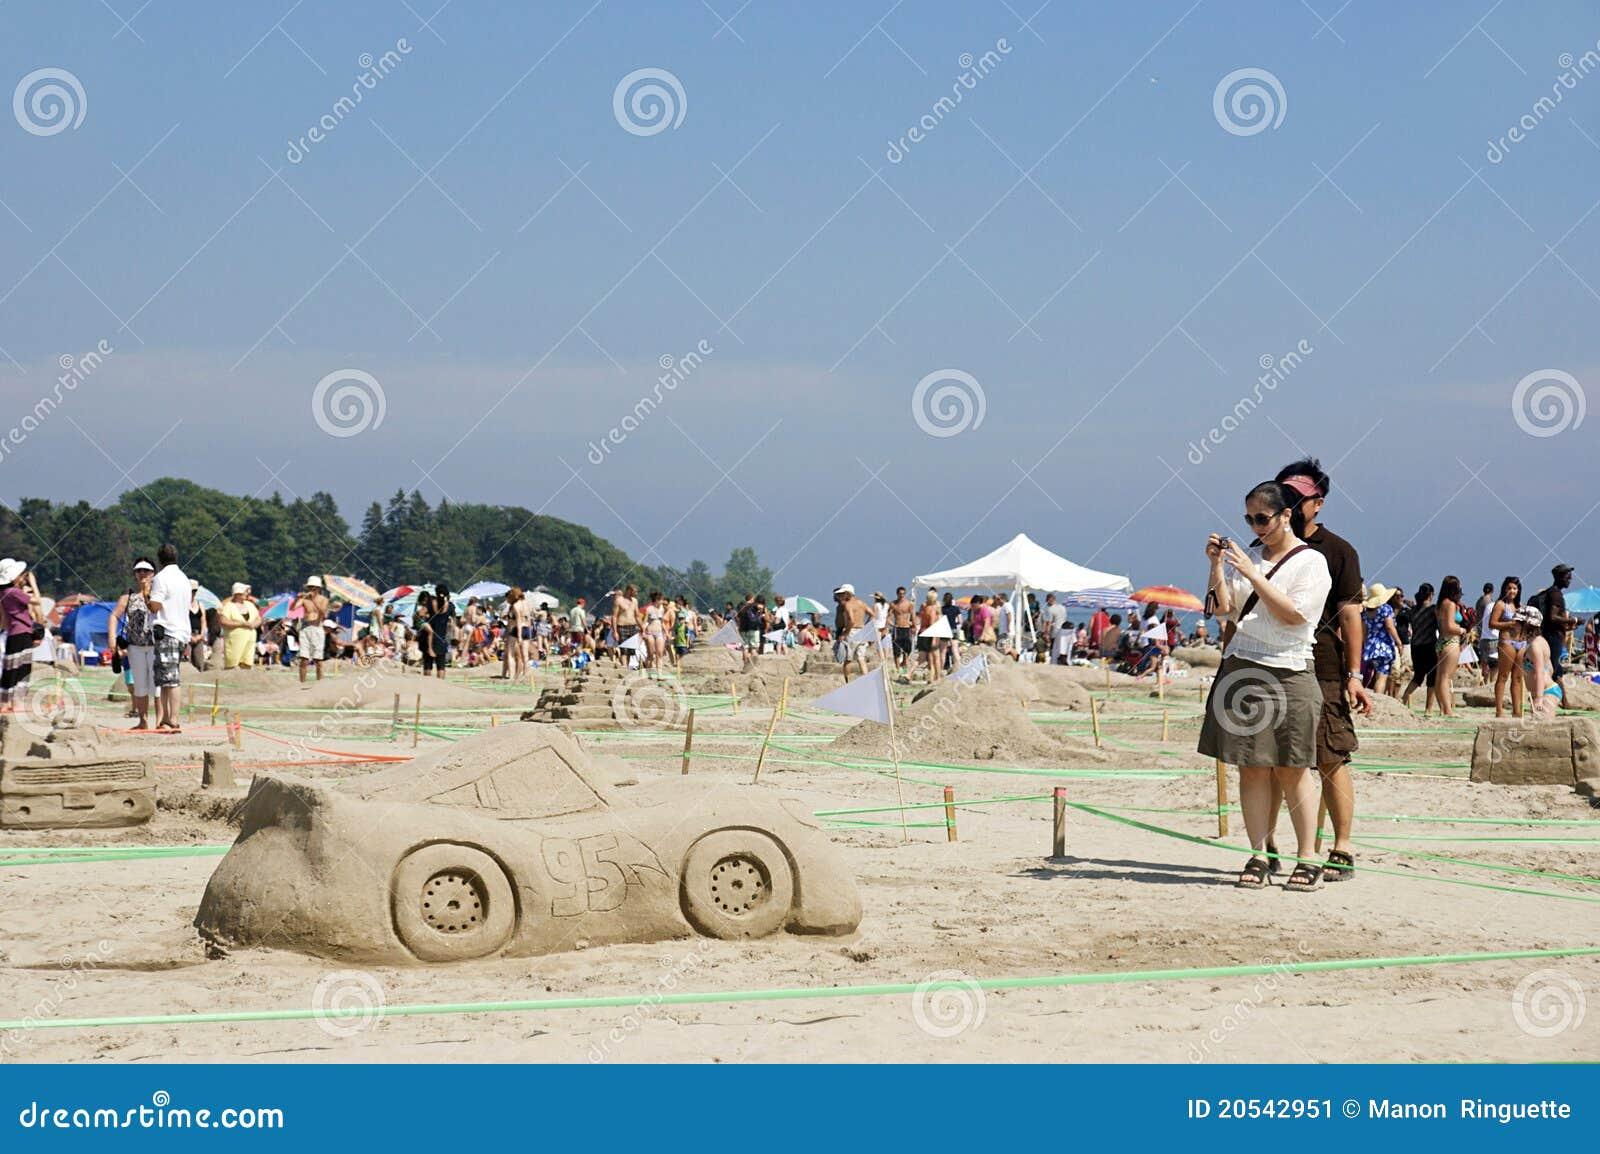 Sandcastle Festival Cobourg Ontario July 2011 Editorial Photo Image 20542951